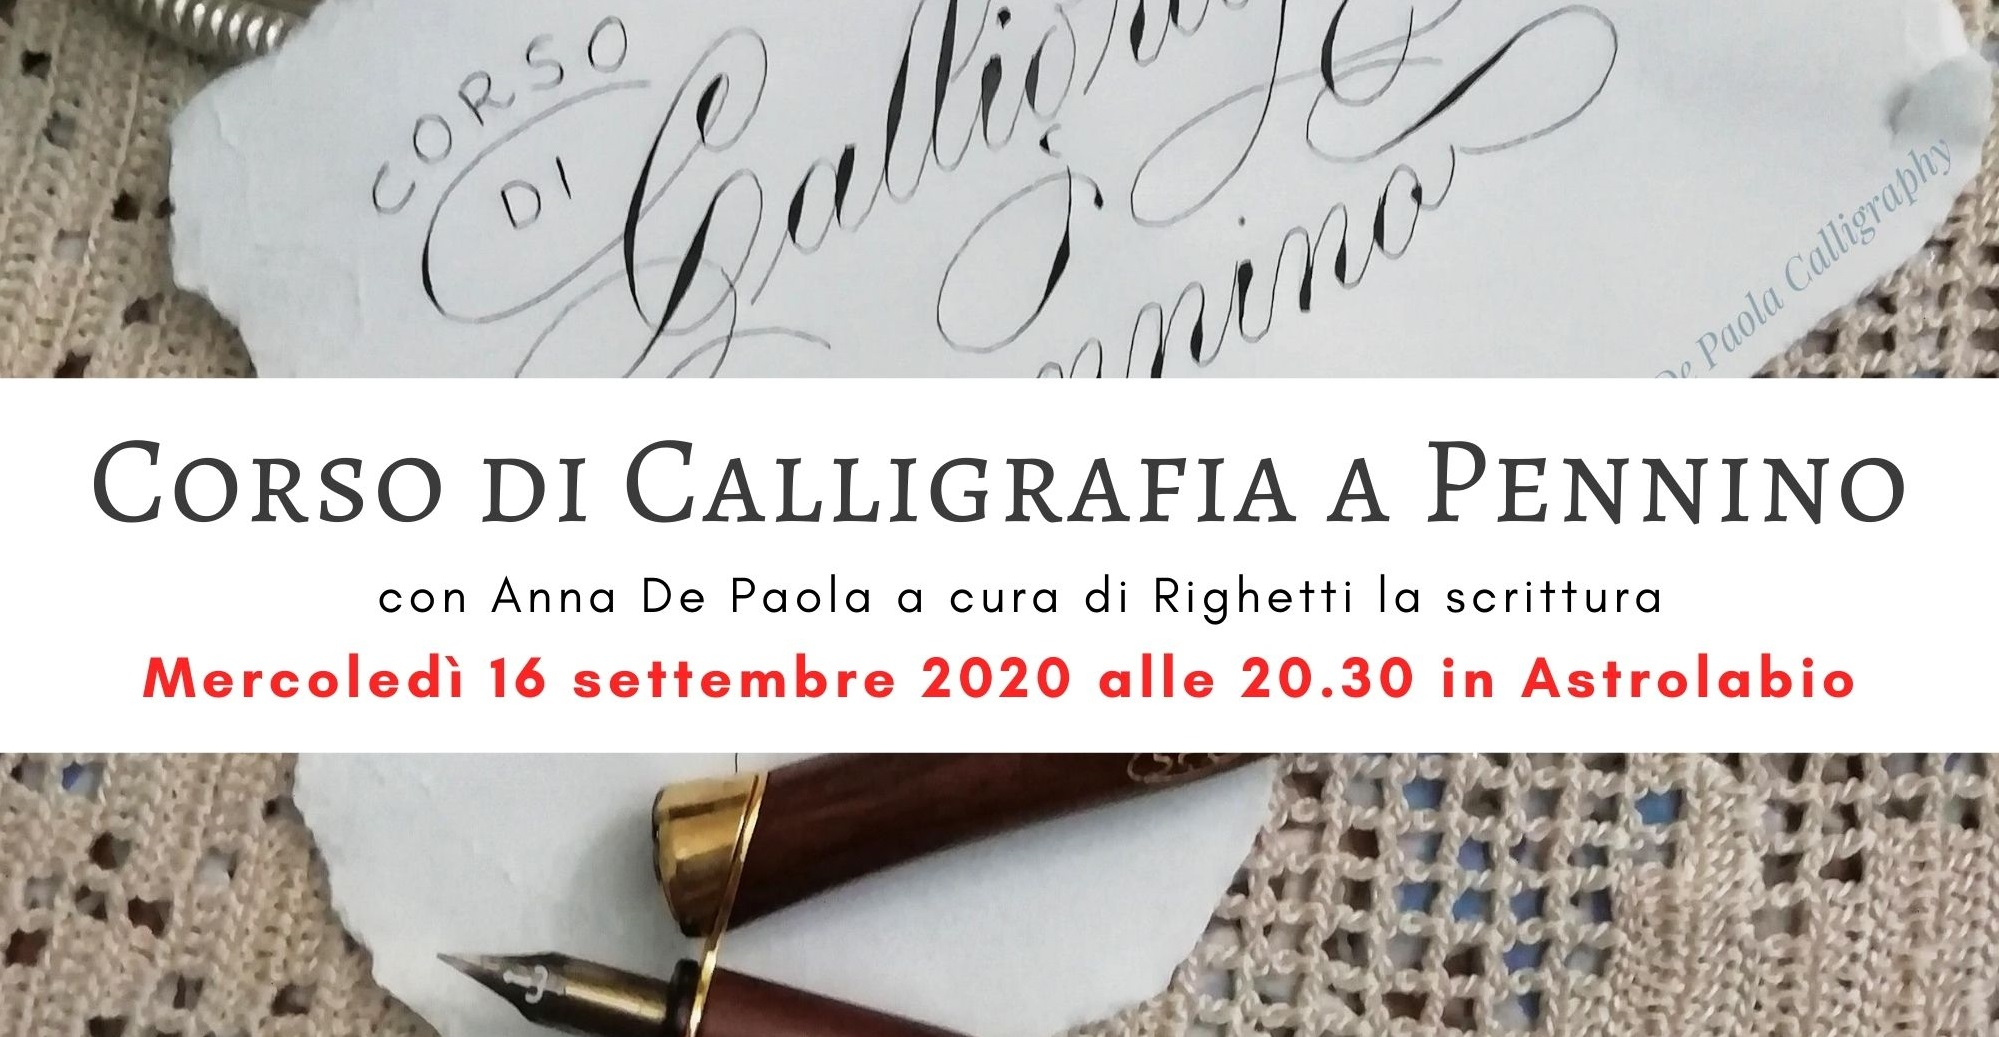 Corso di Calligrafia con Anna de Paola